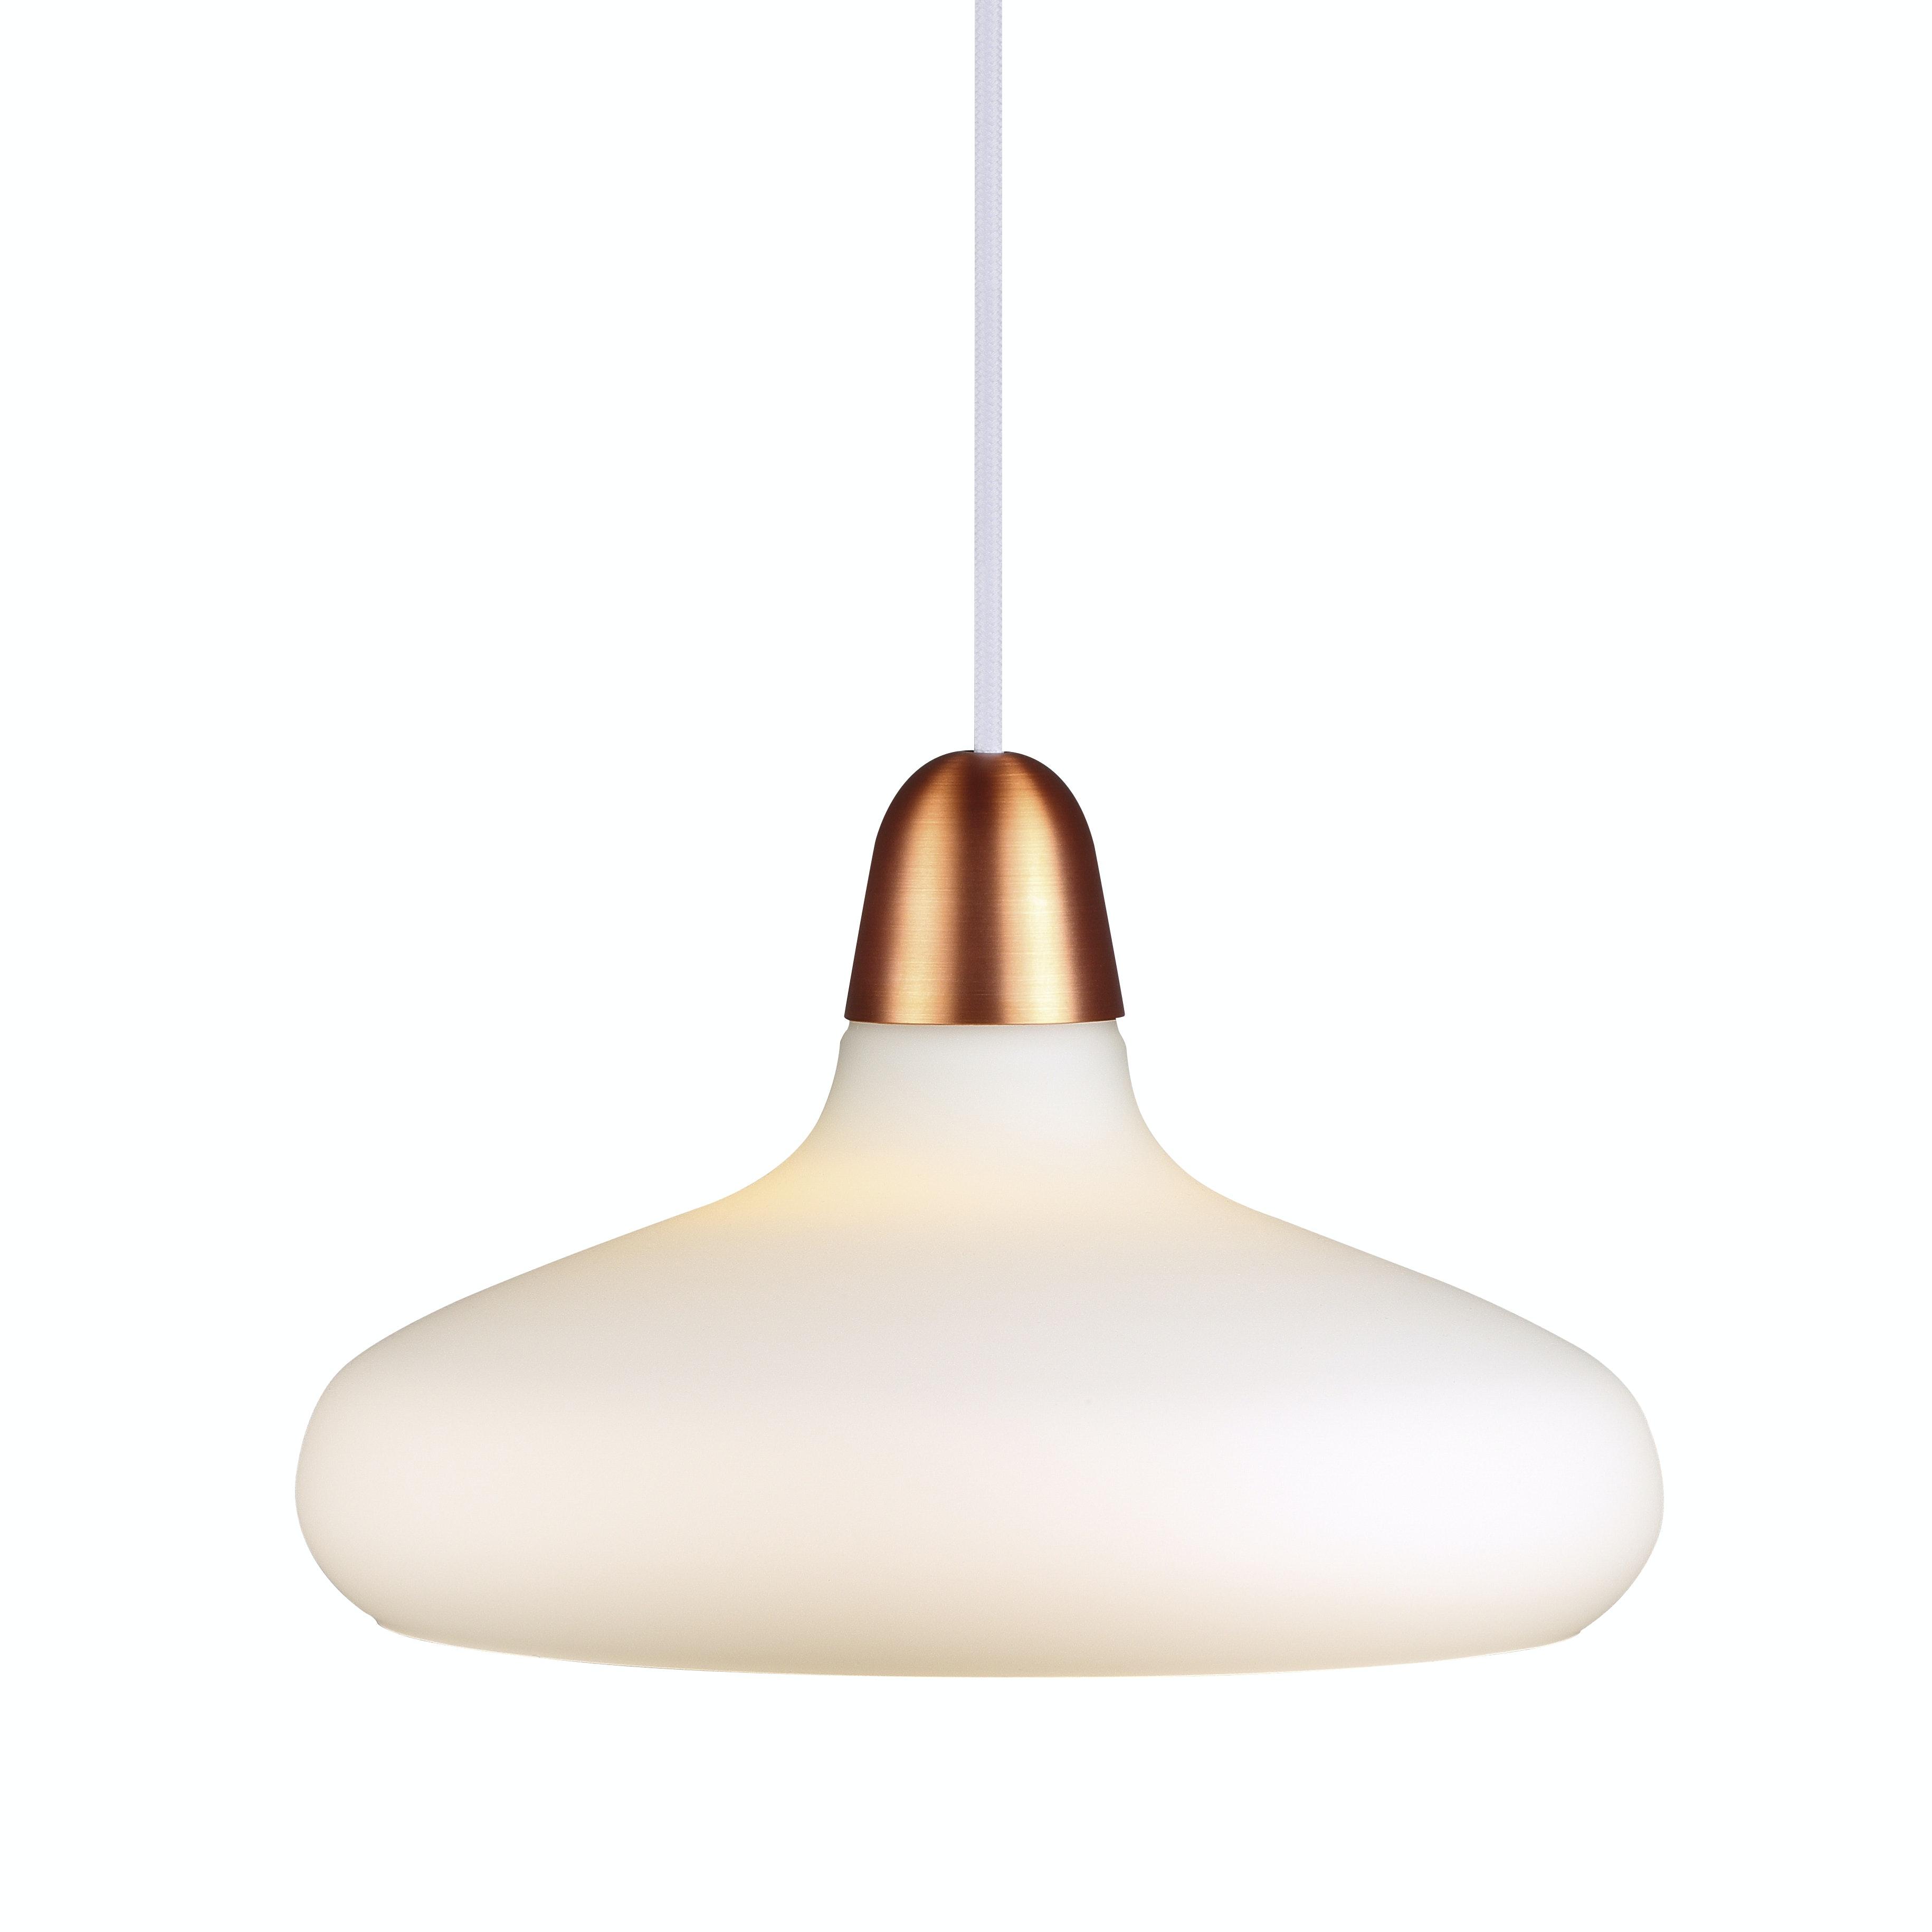 Lampa Pendel Nordlux Bloom 29 E27 Koppar Borstat Stål